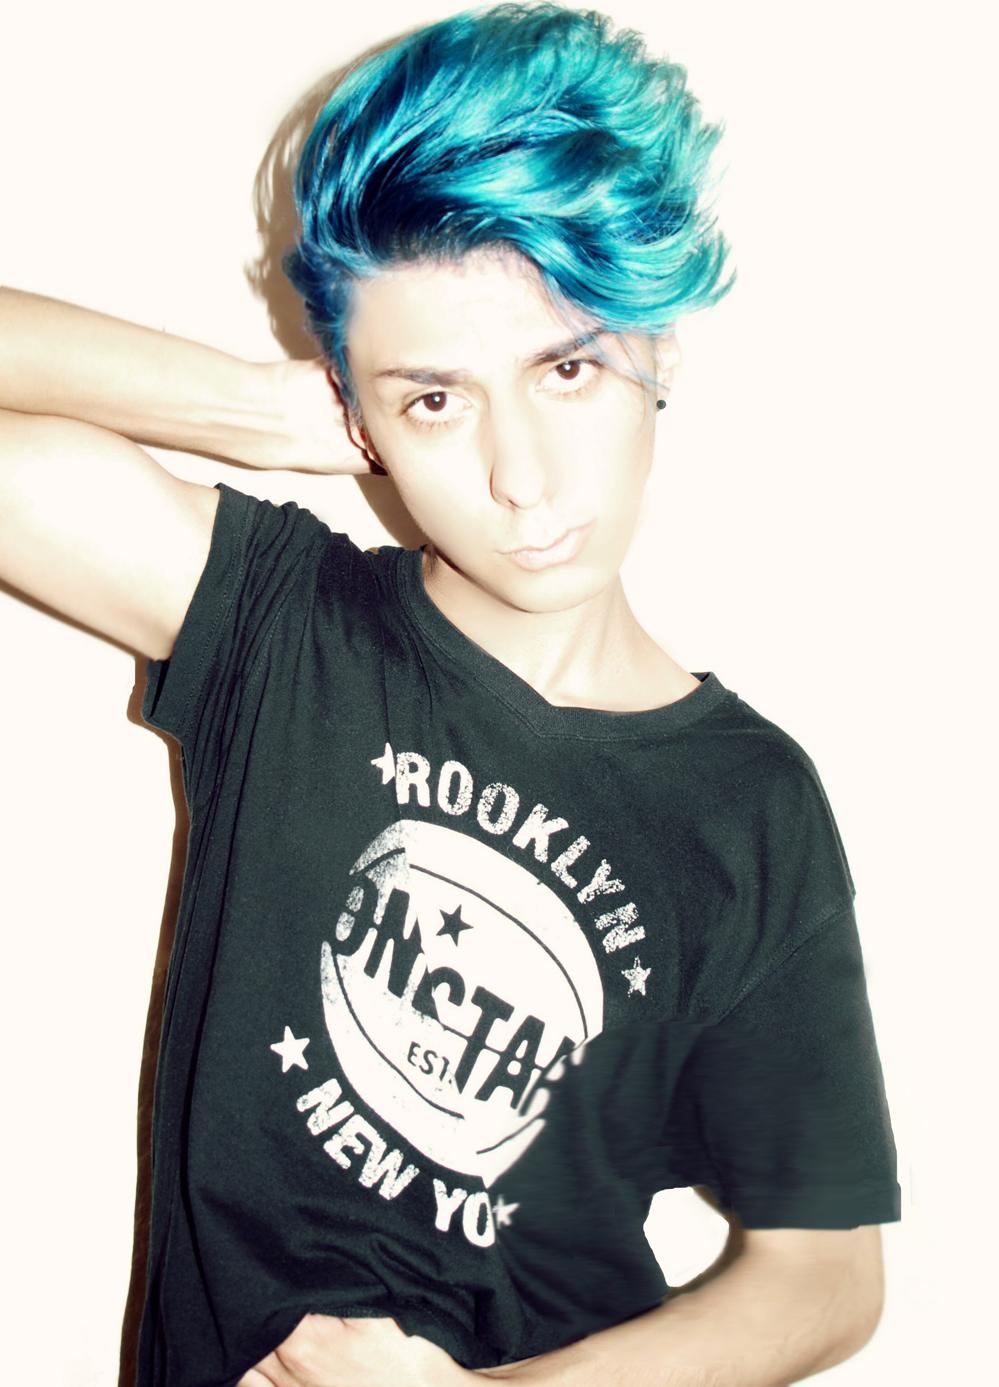 turquoise-hair-guys.jpg